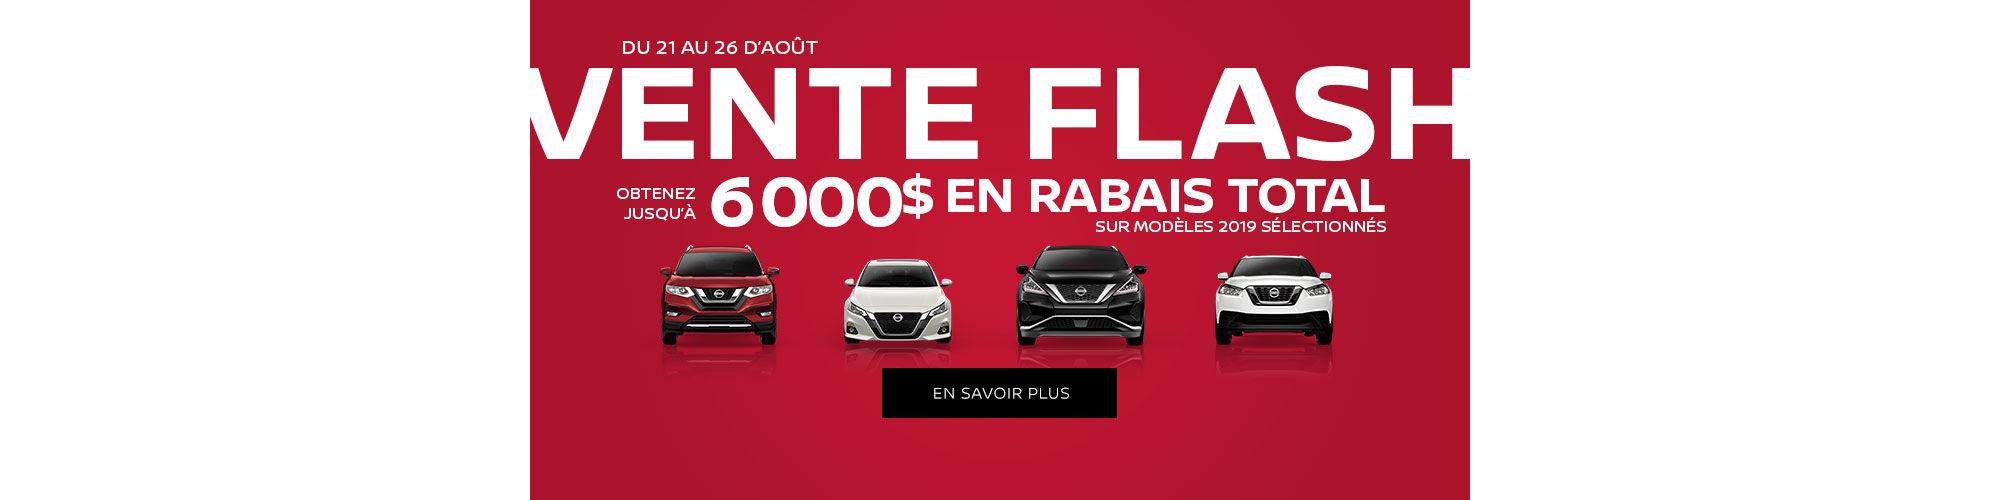 Vente Flash Nissan